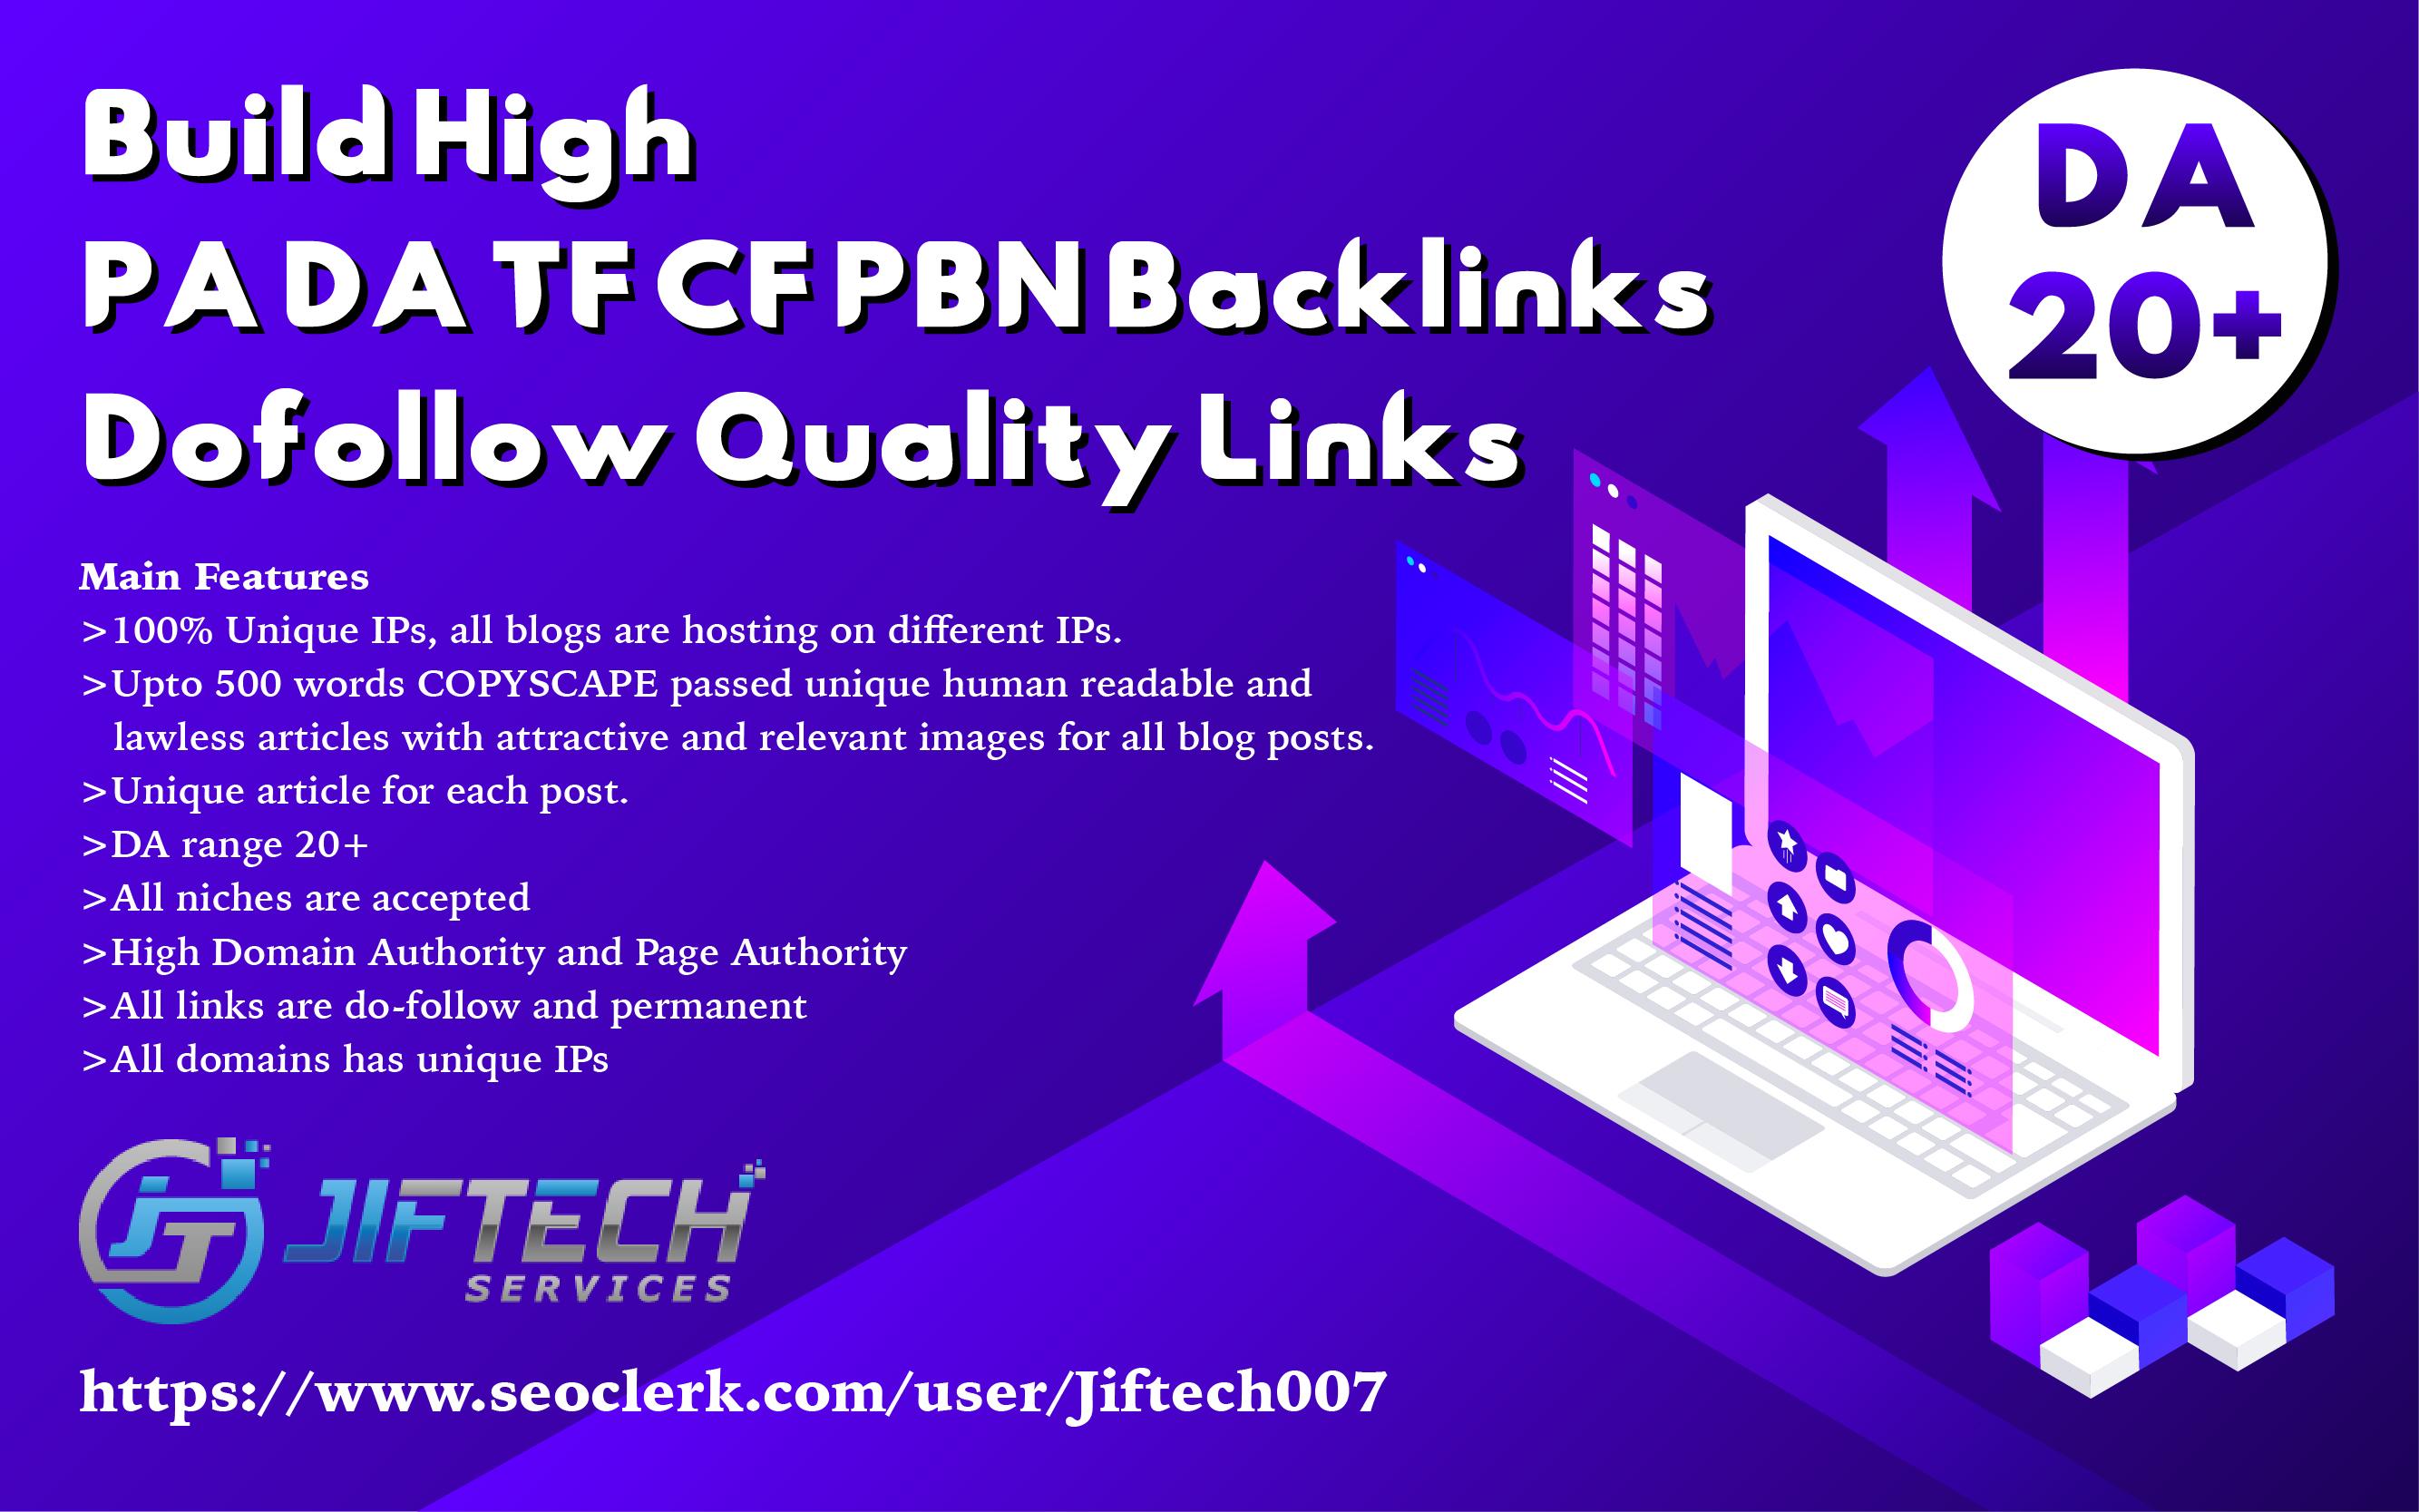 Build High PA DA20+ TF CF 20 PBN Backlinks - Dofollow Quality Links